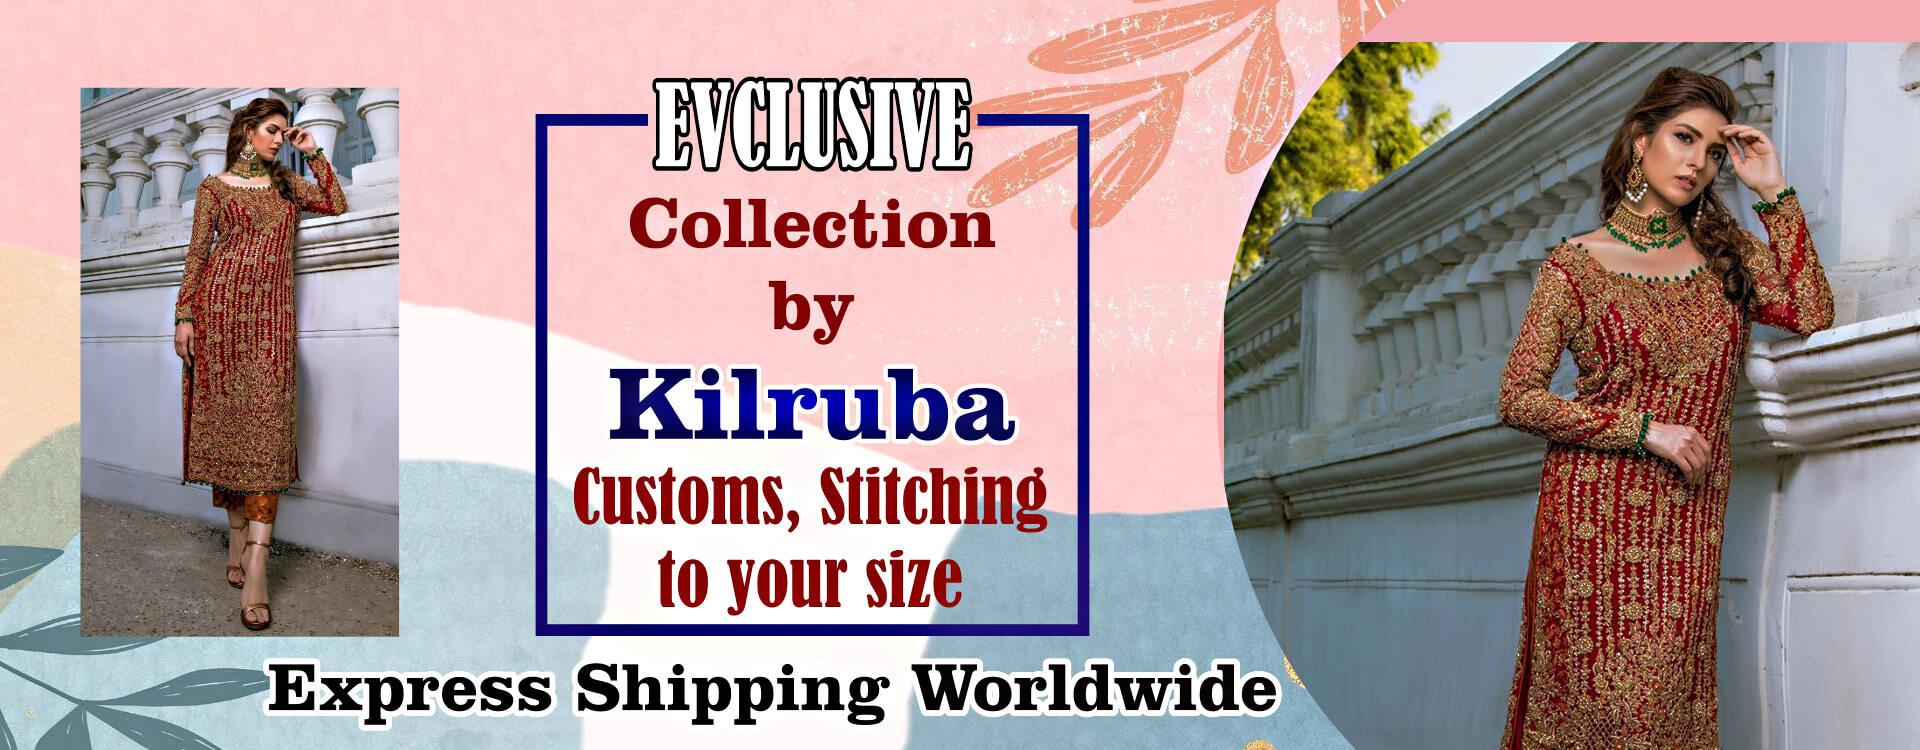 exclusive-collection-by-kilruba-pakistani-suits-wholesale